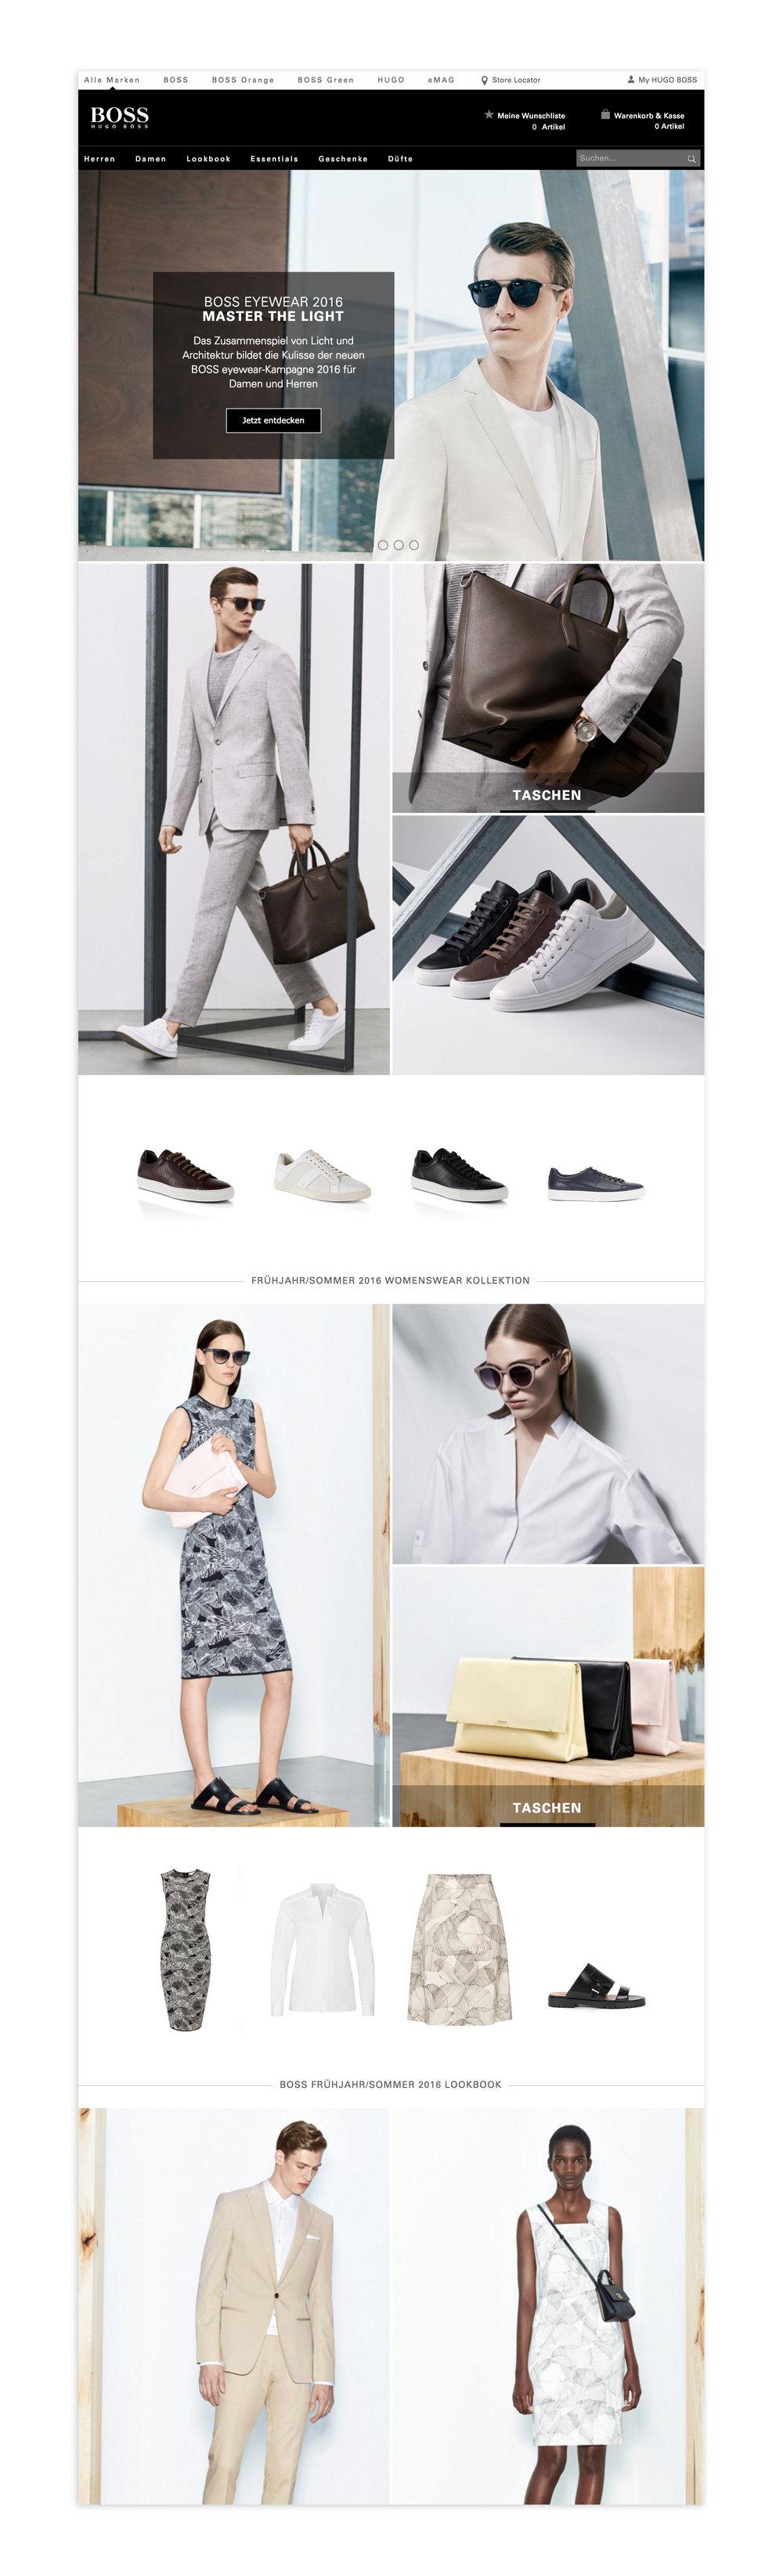 WERBEWELT-HUGO-BOSS-eCommerce-Brand-Online-Shop-Platform-1